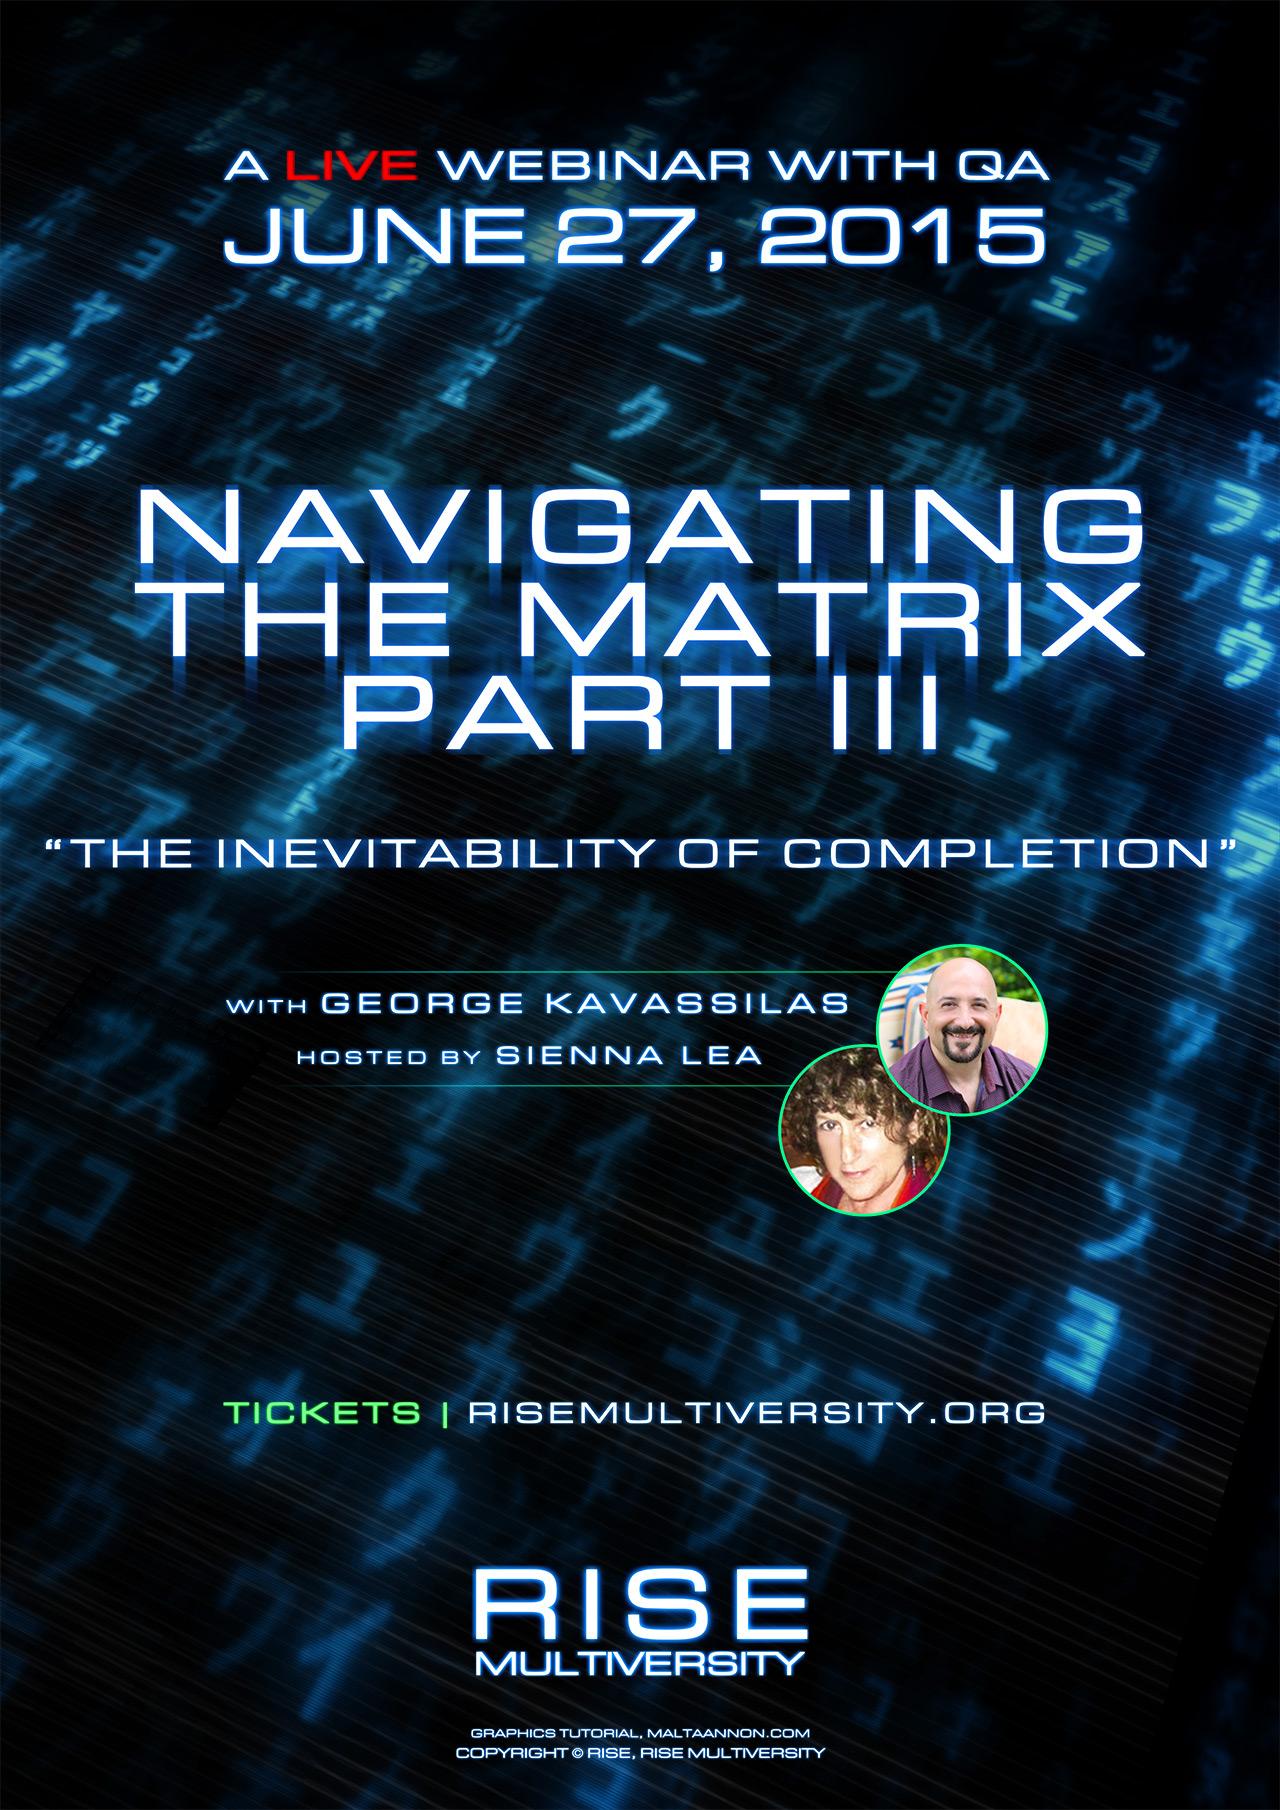 Navigating The Matrix Part III